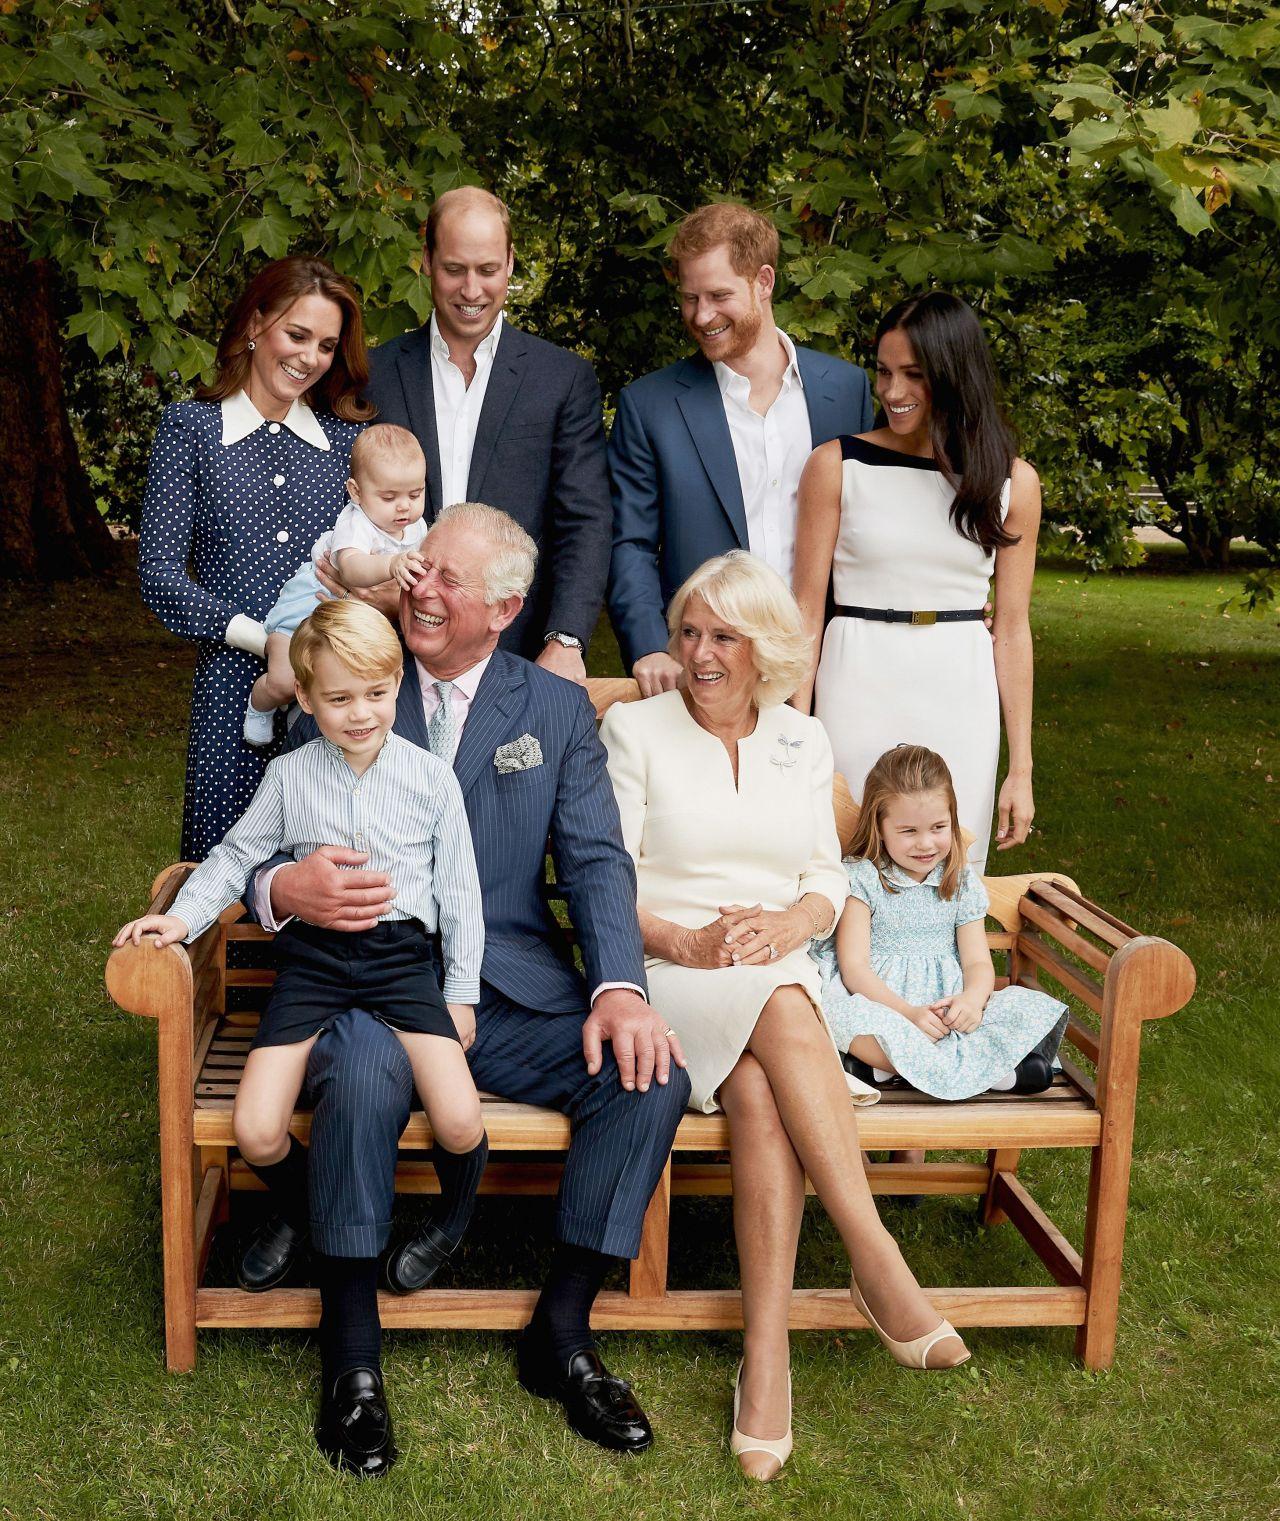 Kate Middleton, Prince William, Meghan Markle & Prince